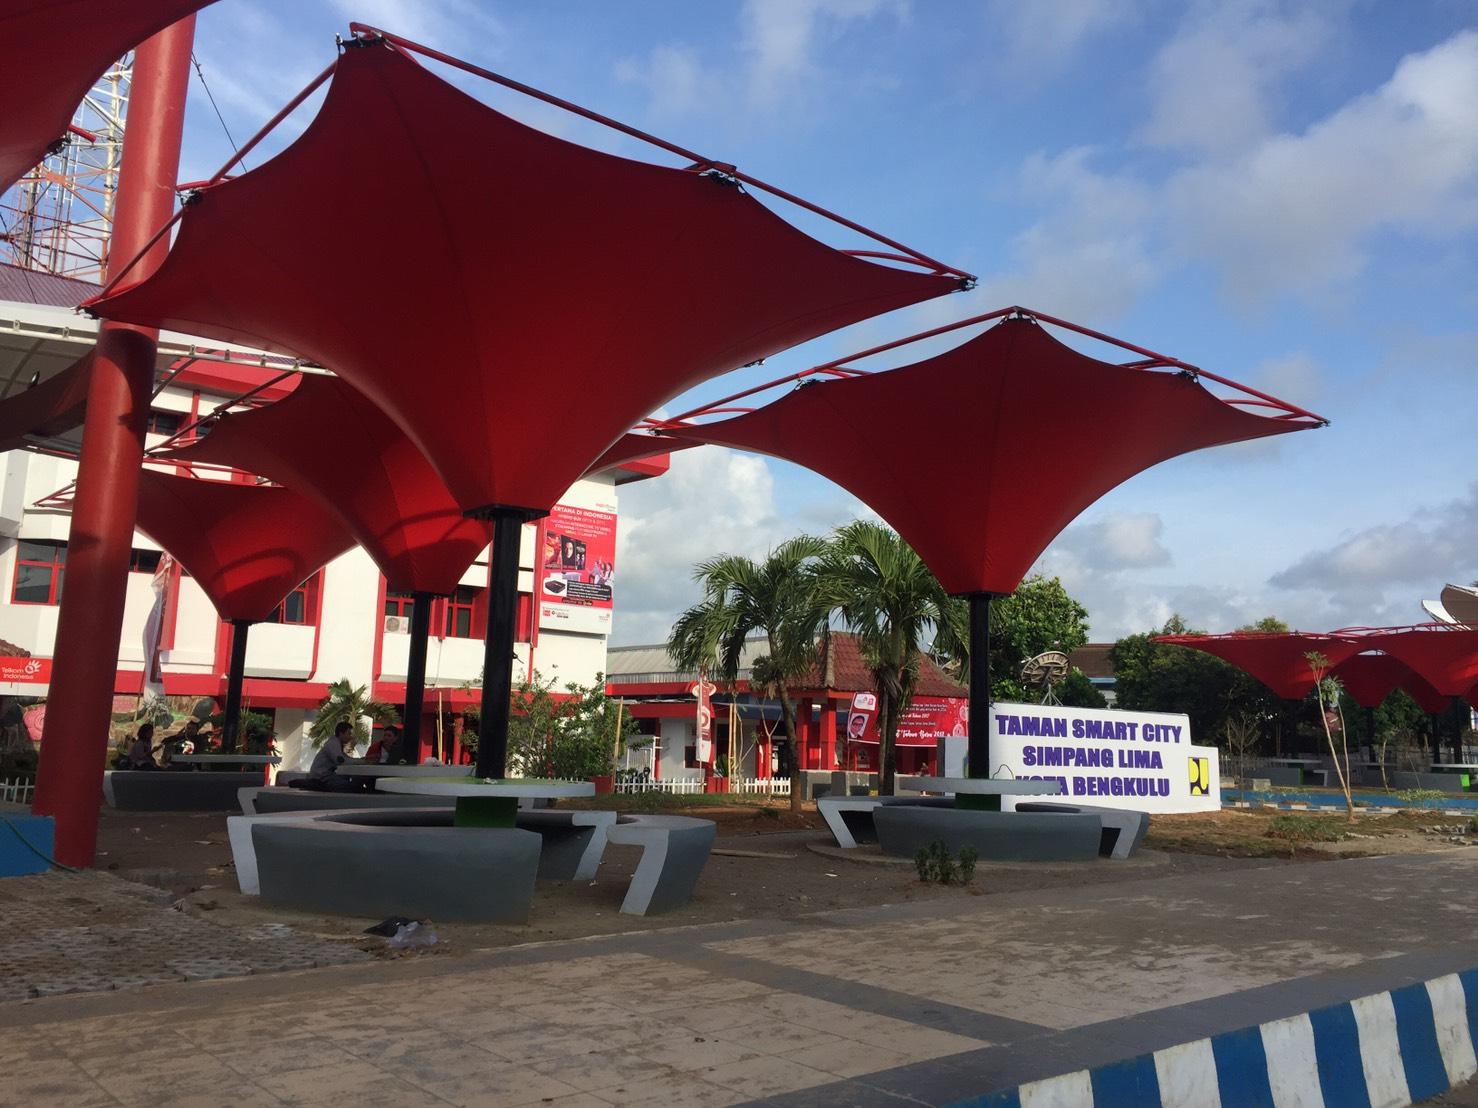 Blog Visit Bengkulu Taman Pintar Tugu Pers Kota